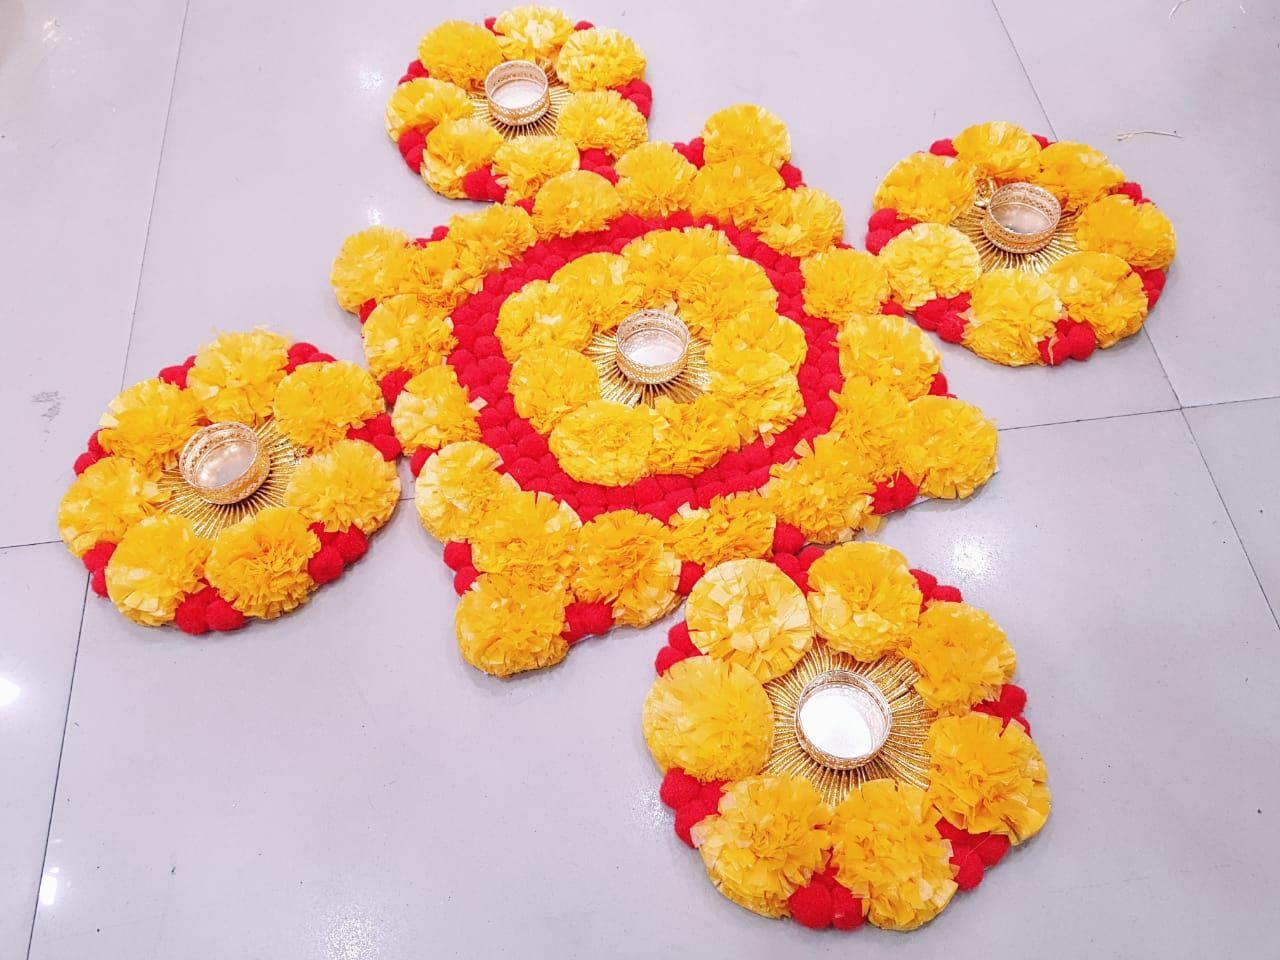 Flowers Decoration On Flowers Flower Decorations Flower Rangoli Floating Flowers